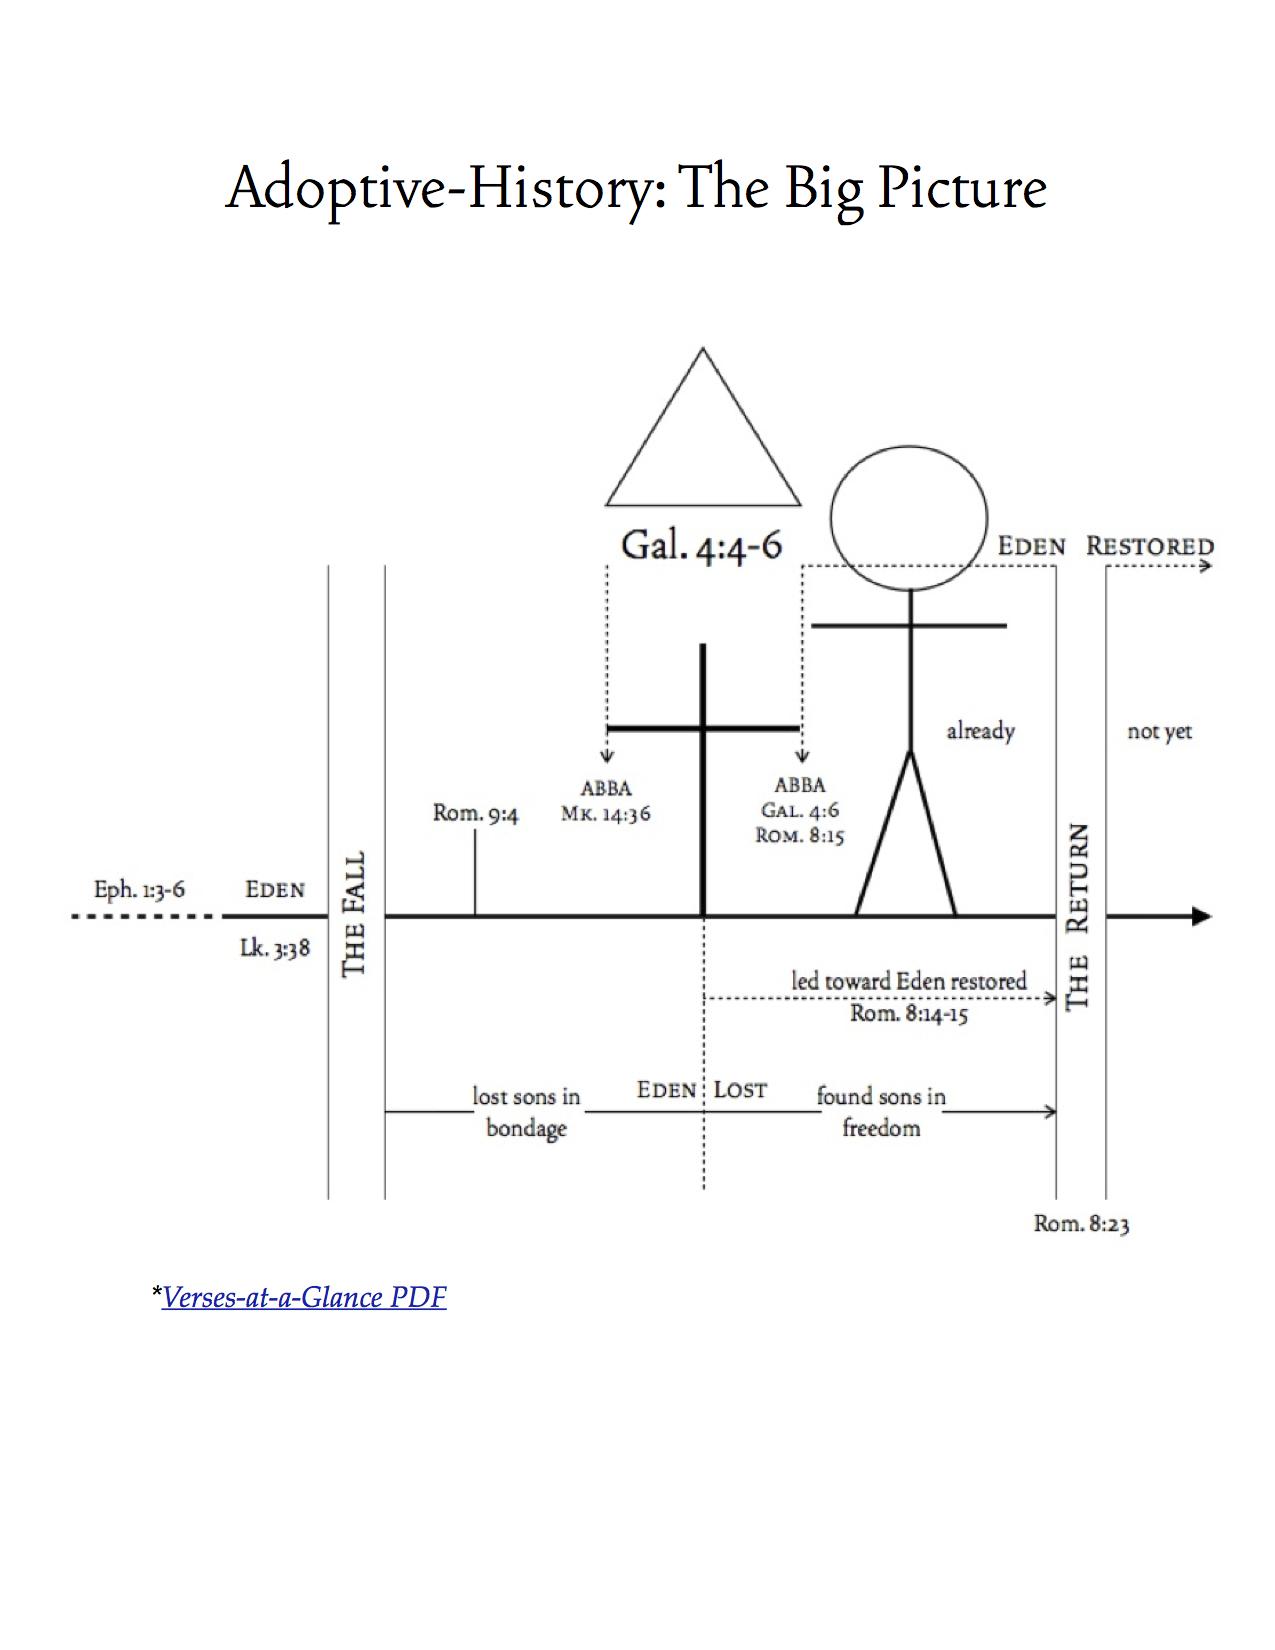 Adoptive History Chart - The Big Picture jpeg